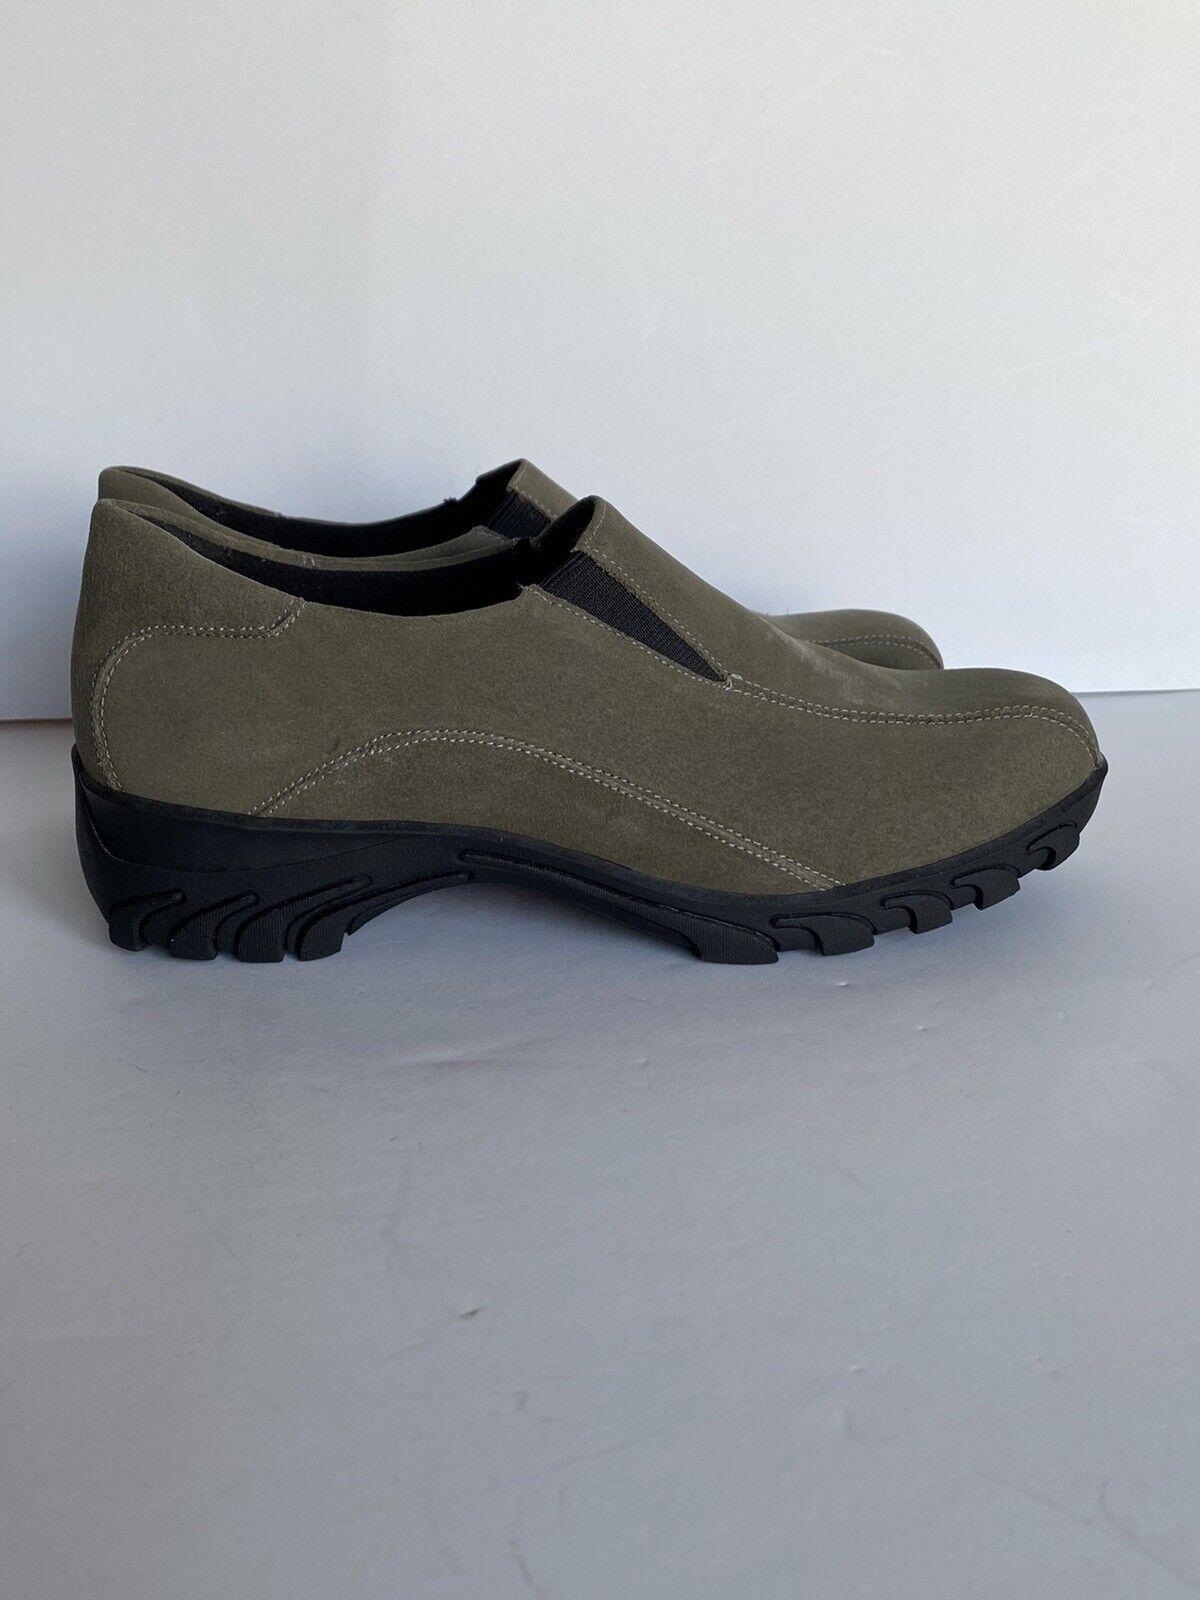 Women's Sporto Shoes Leisure Slip-on Walking Gray Suede Leather Size 8.5